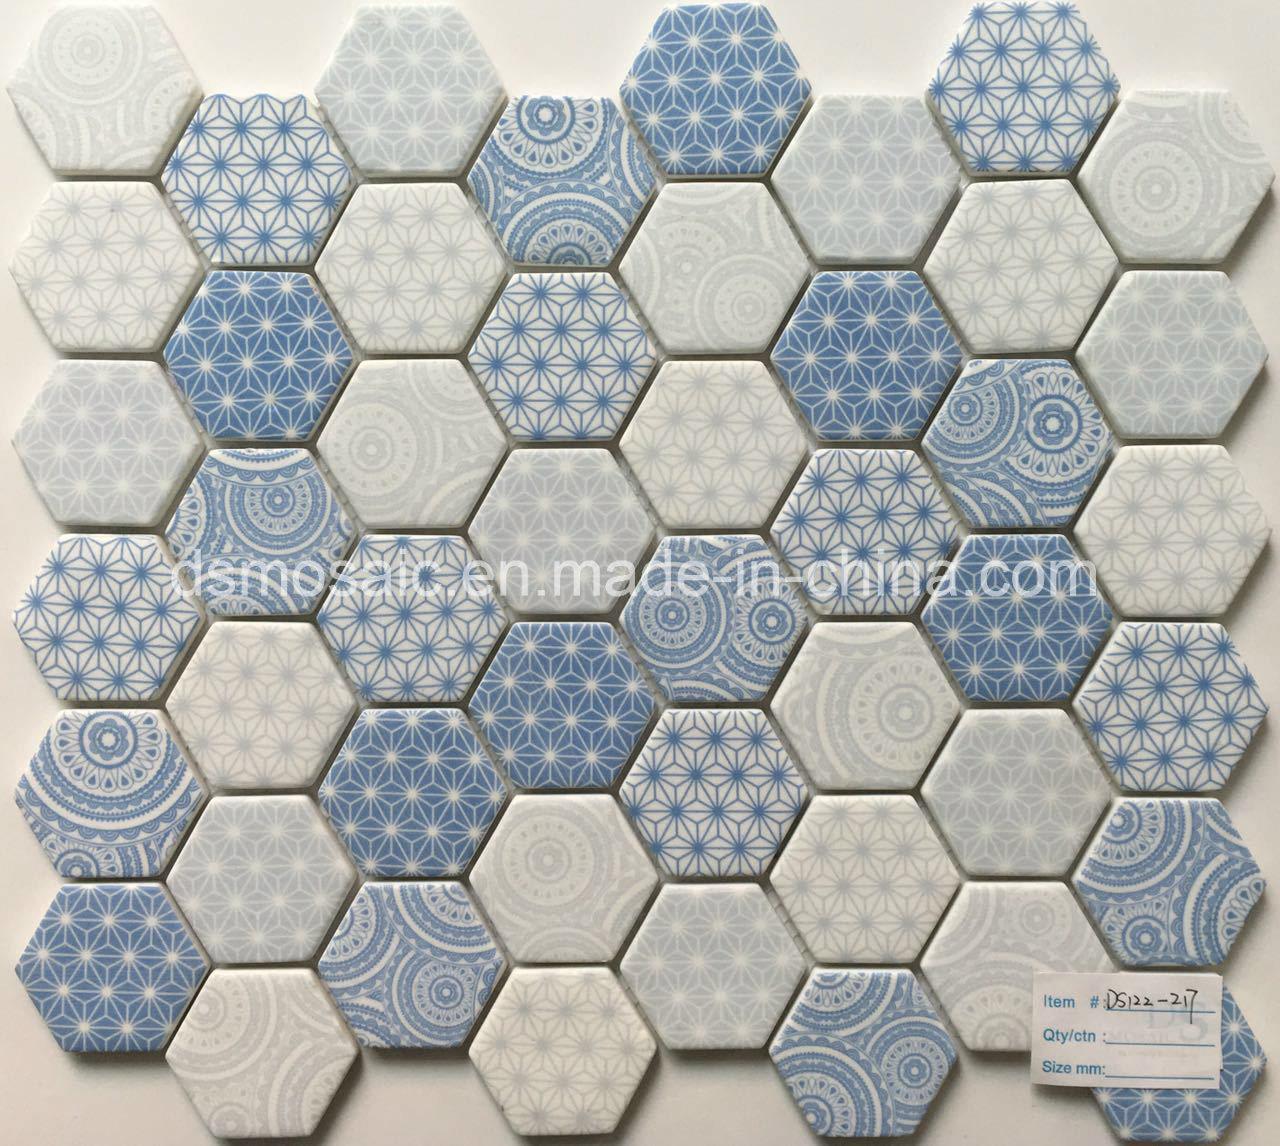 Newest Technology Full Body Hexagon Glass Mosaic Tile